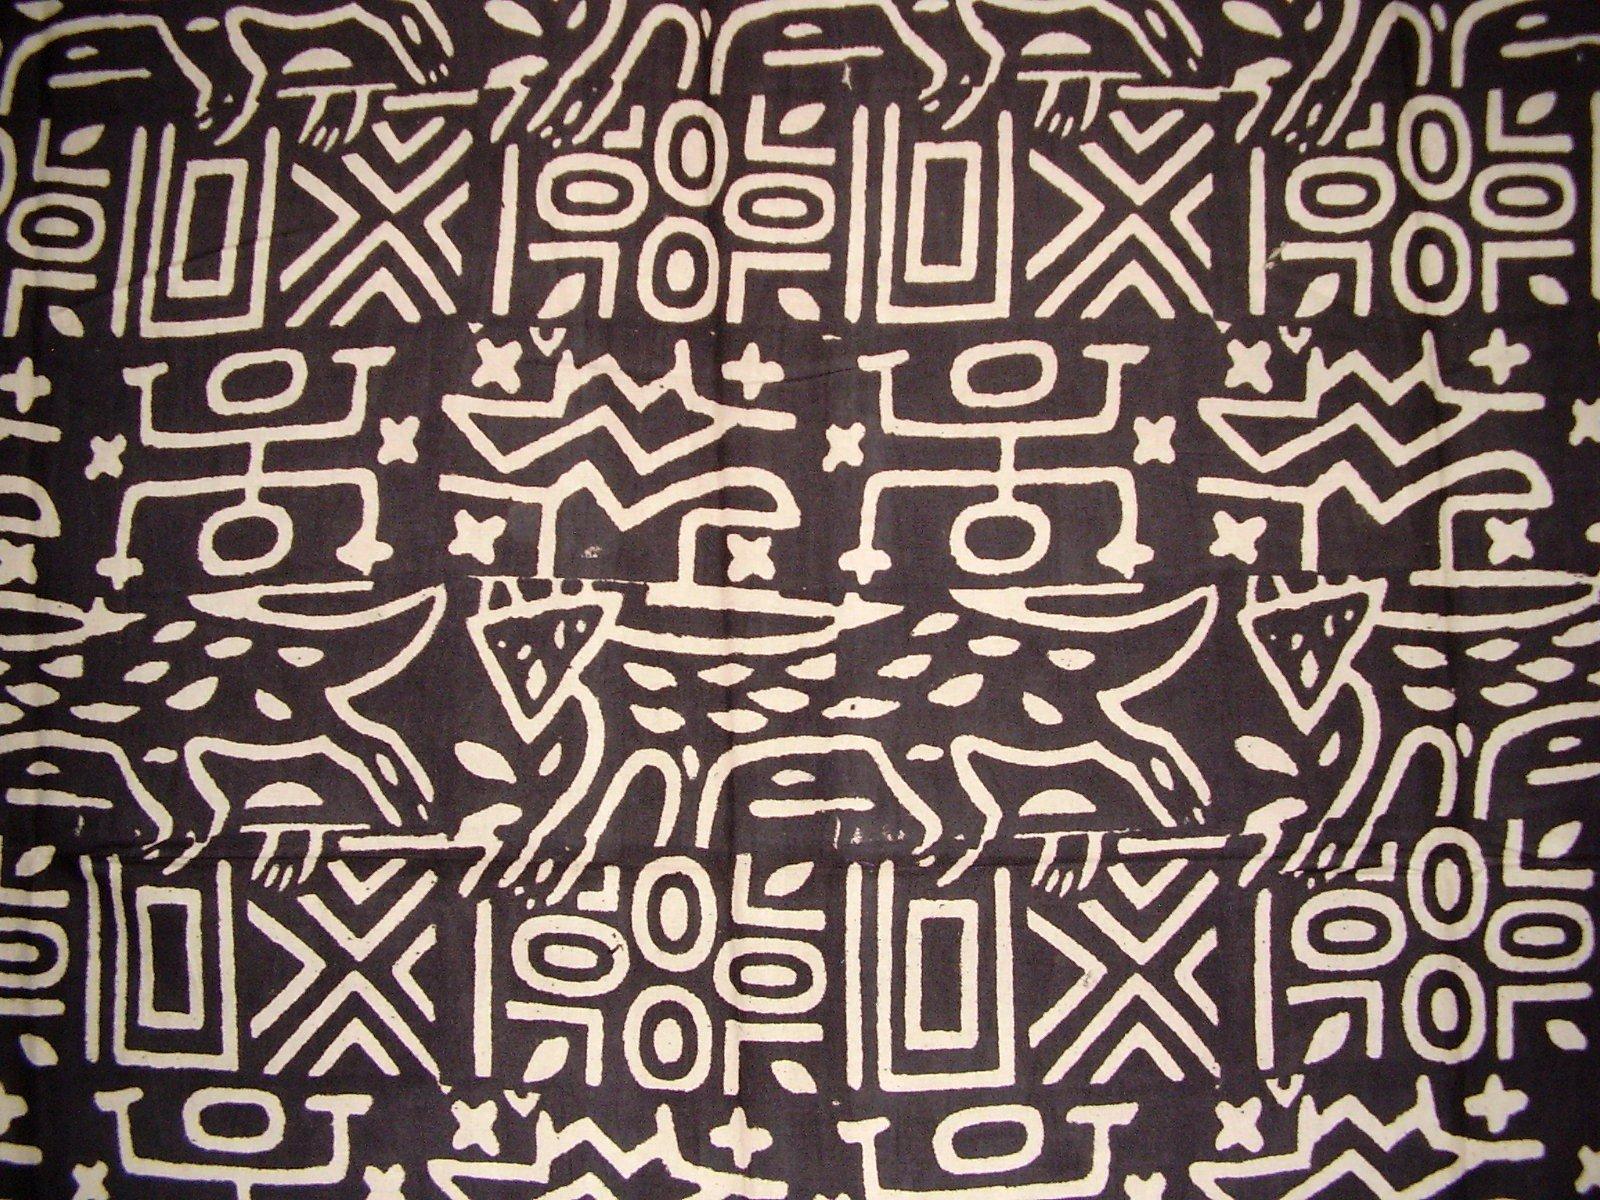 India Arts Primitive Tribal Mud Cloth Tapestry or Spread Cotton 104'' x 104'' Queen Black